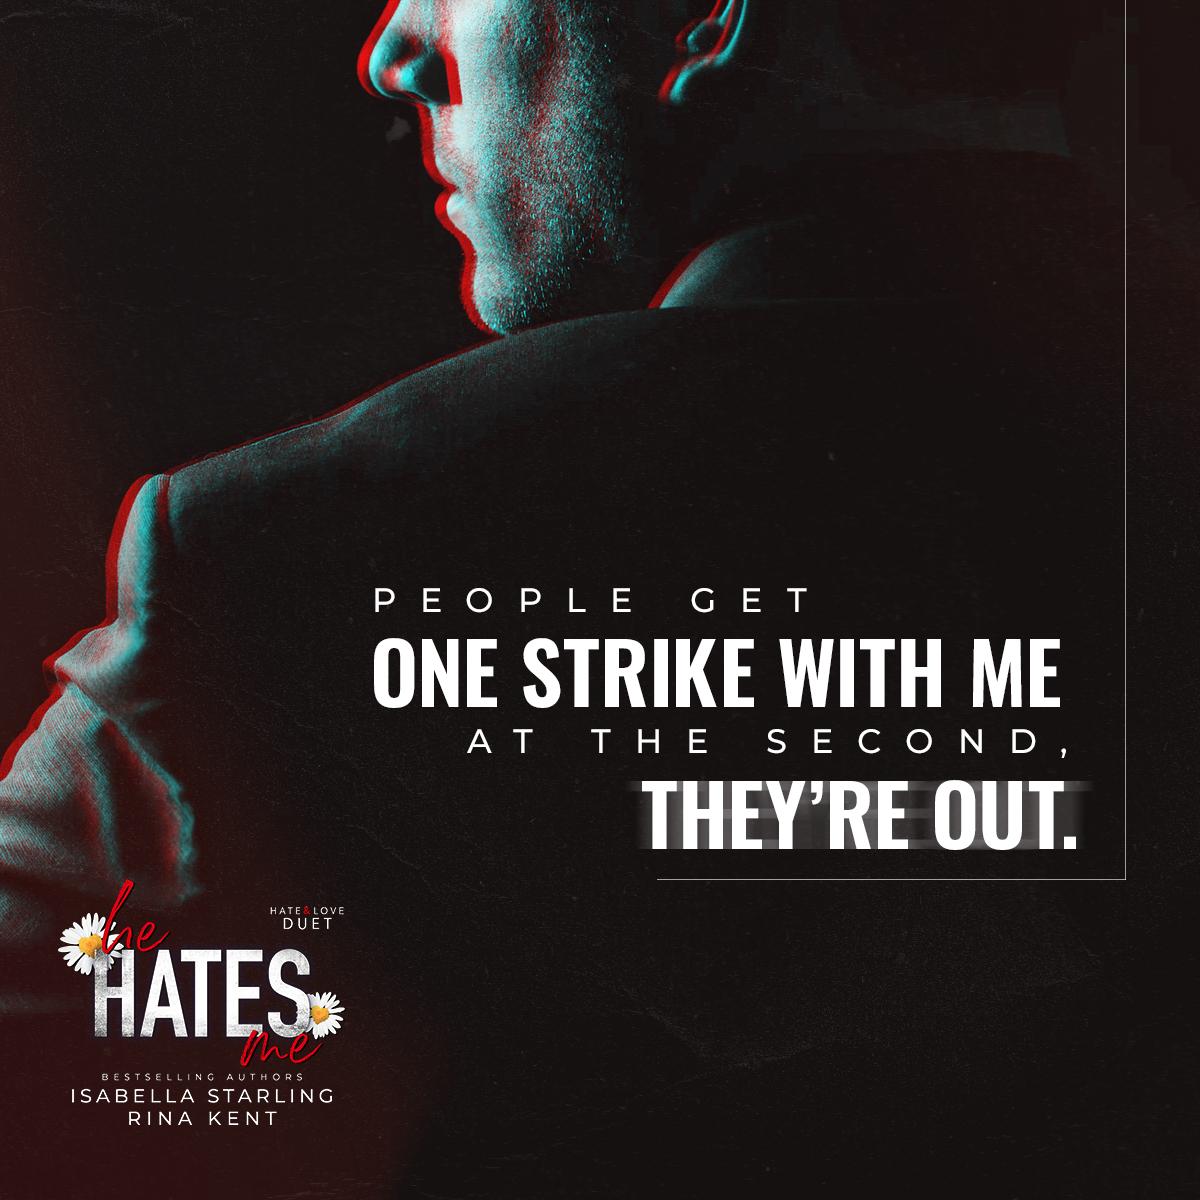 he_hates_me-5